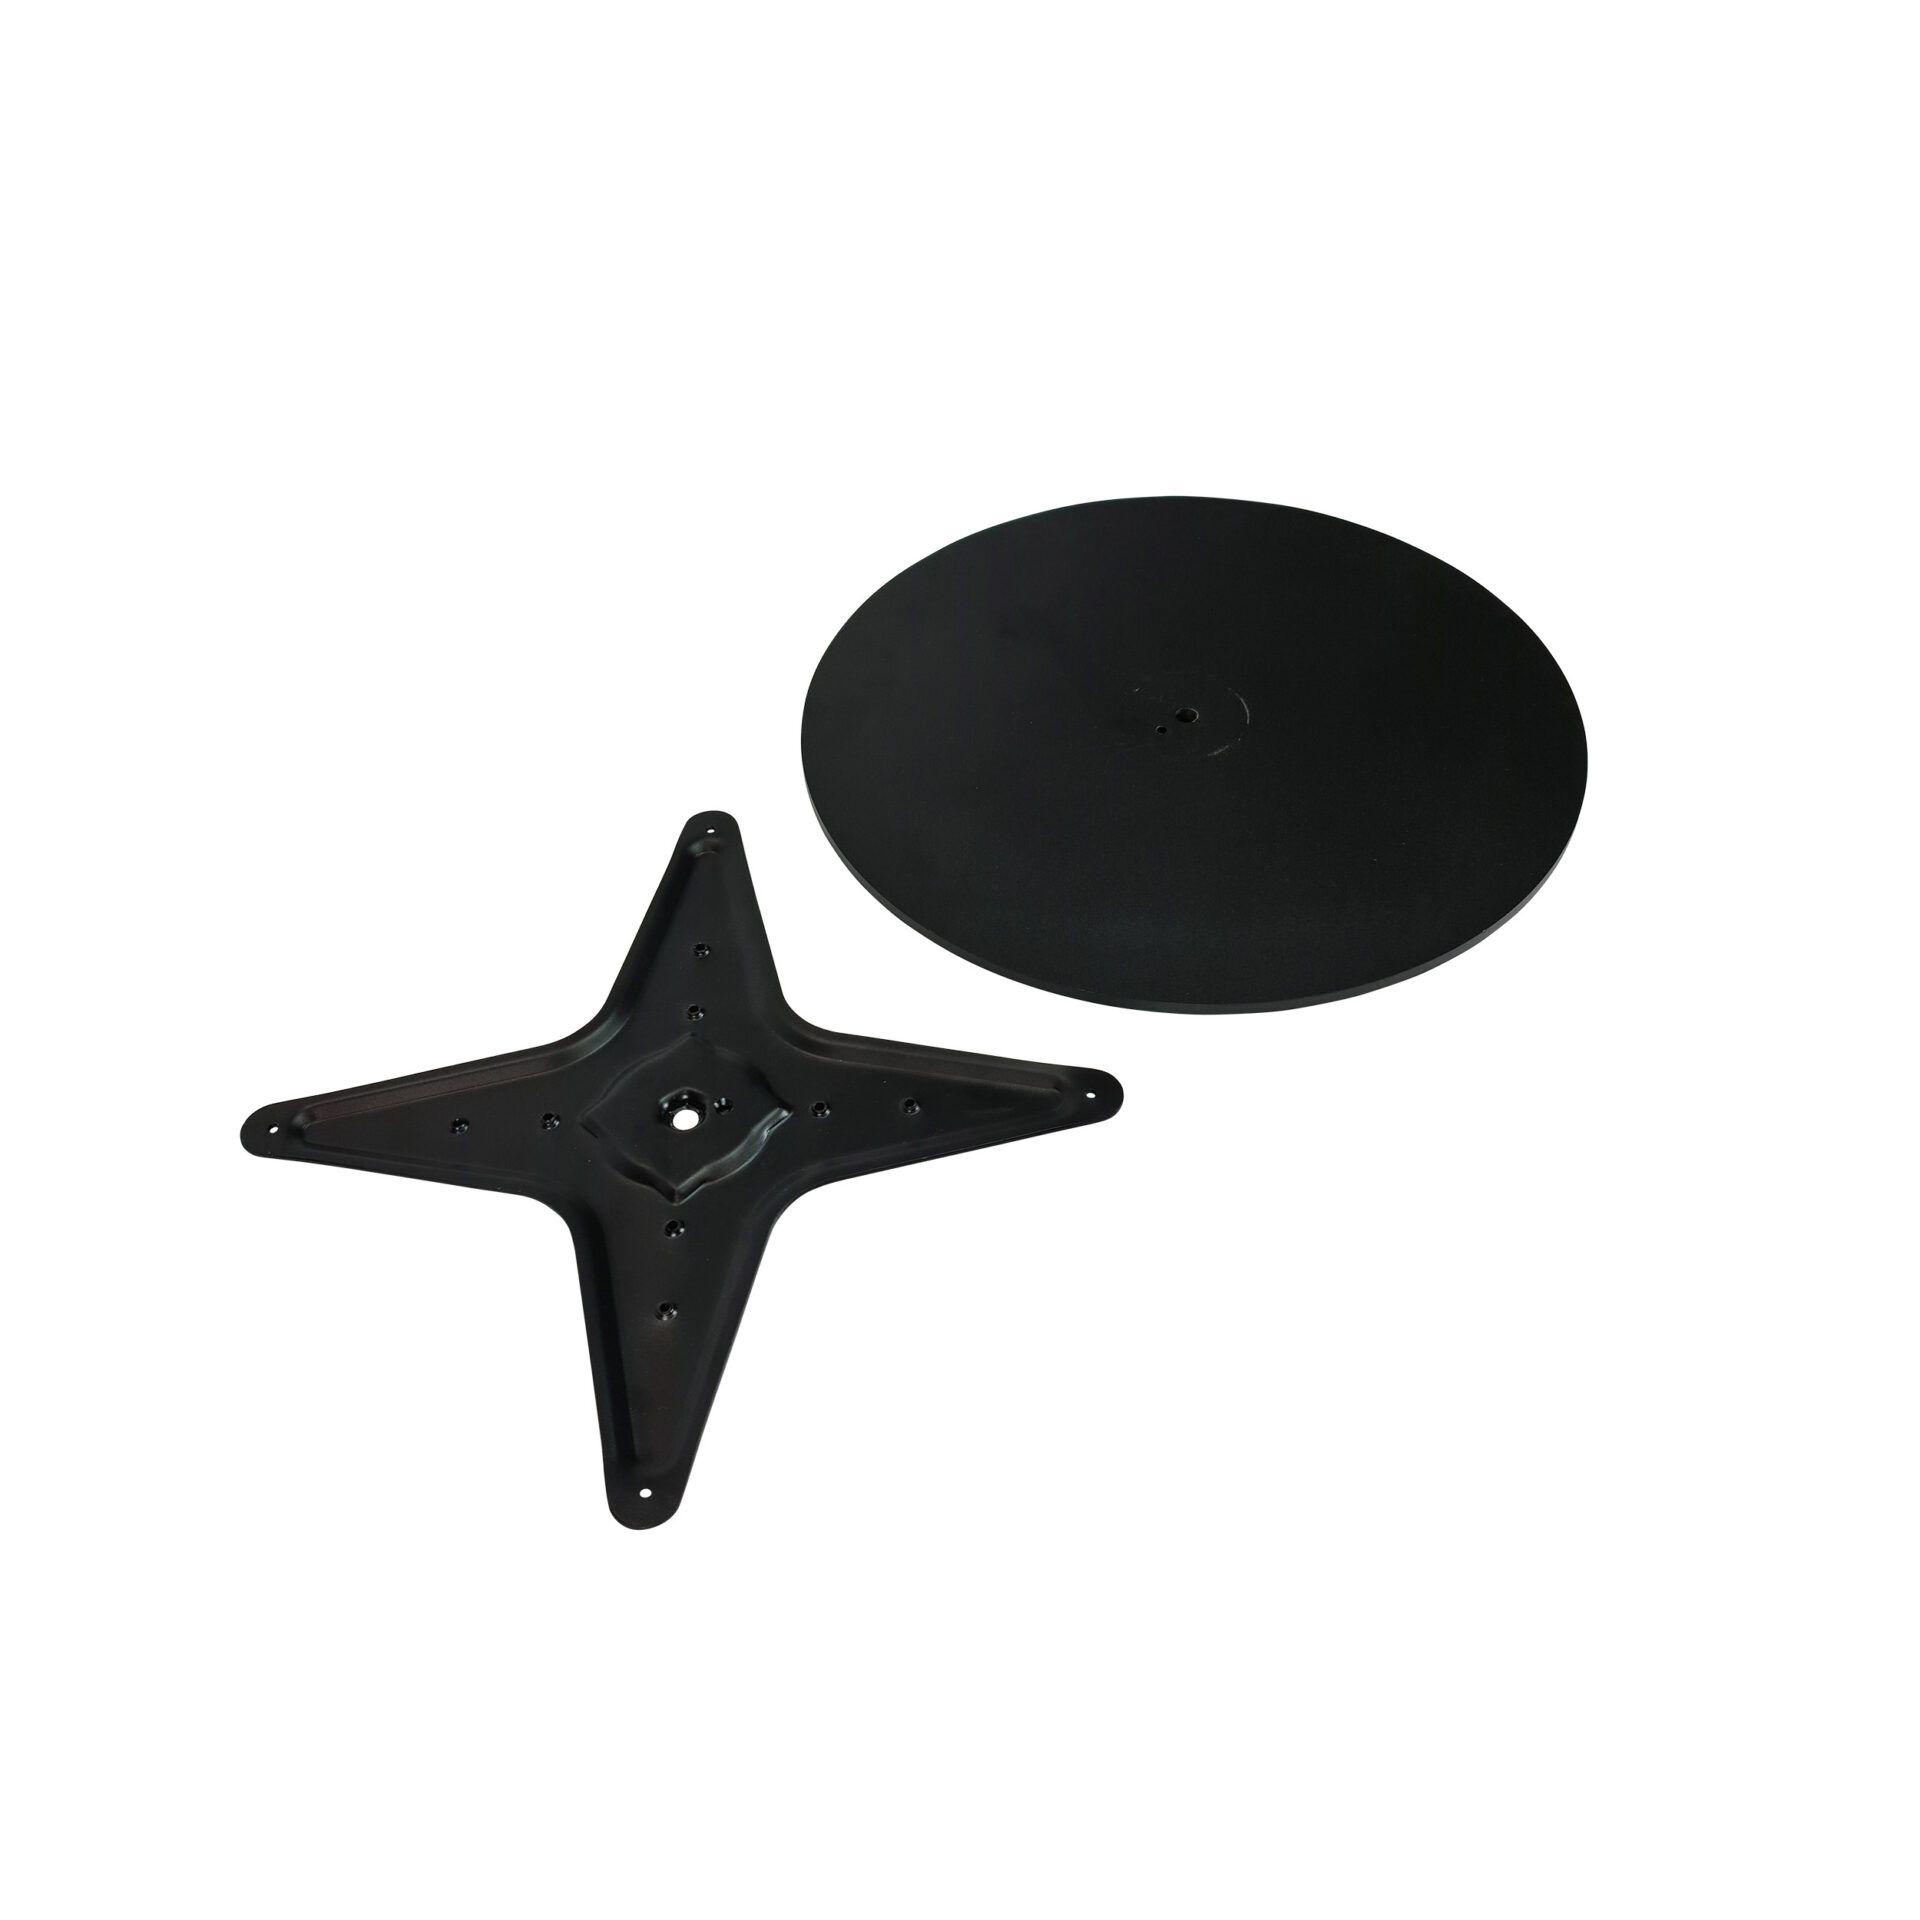 lyon table base black.star base.parts